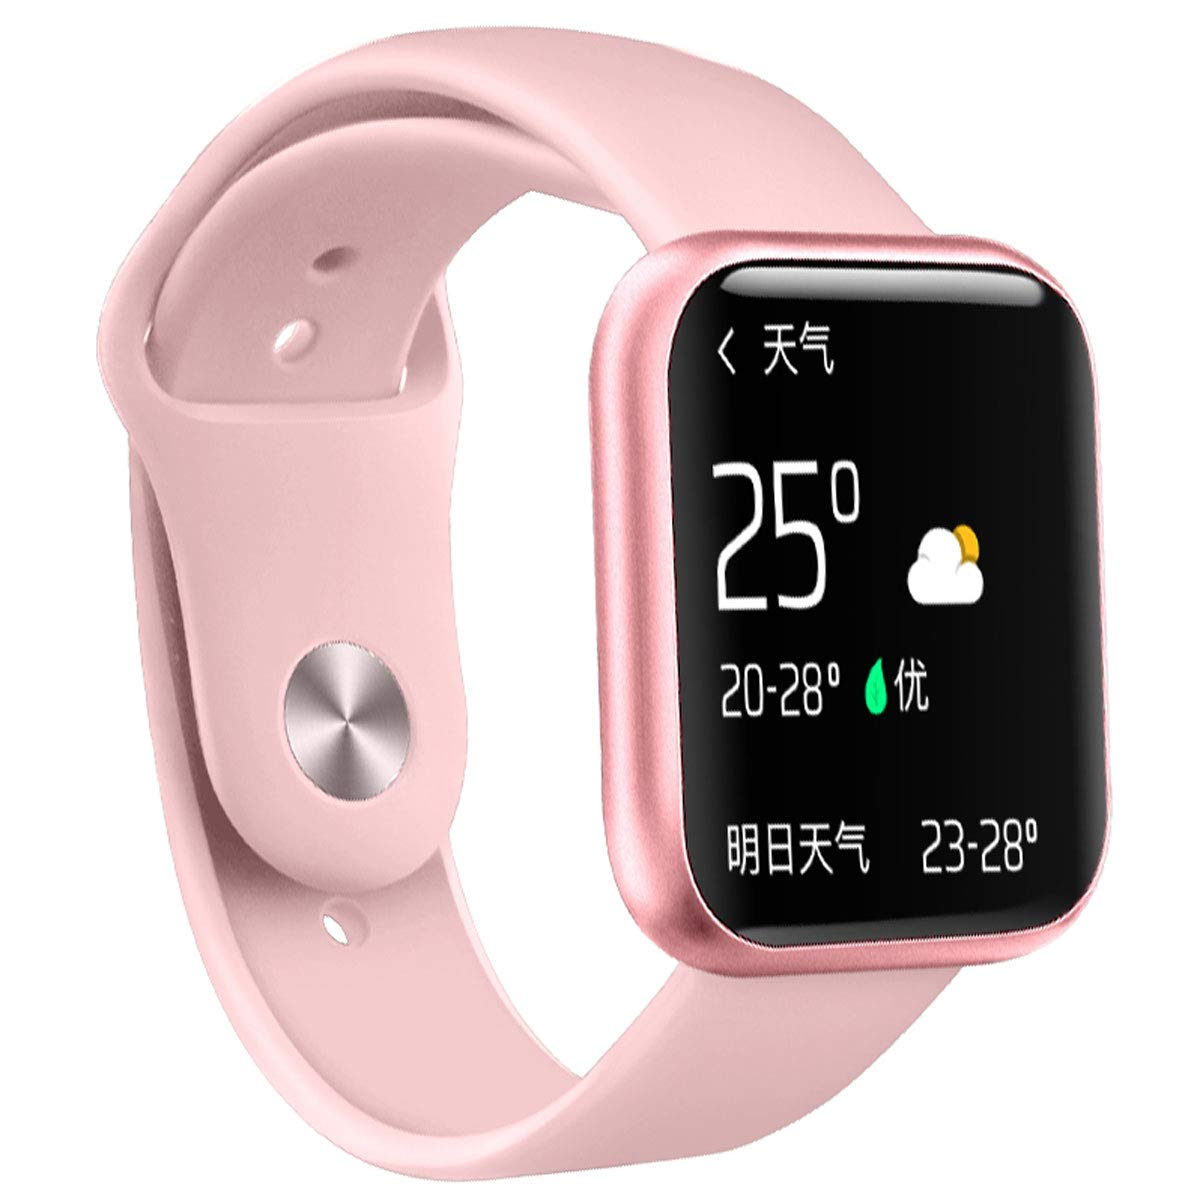 Amazon.com: Reloj inteligente con pantalla táctil completa ...